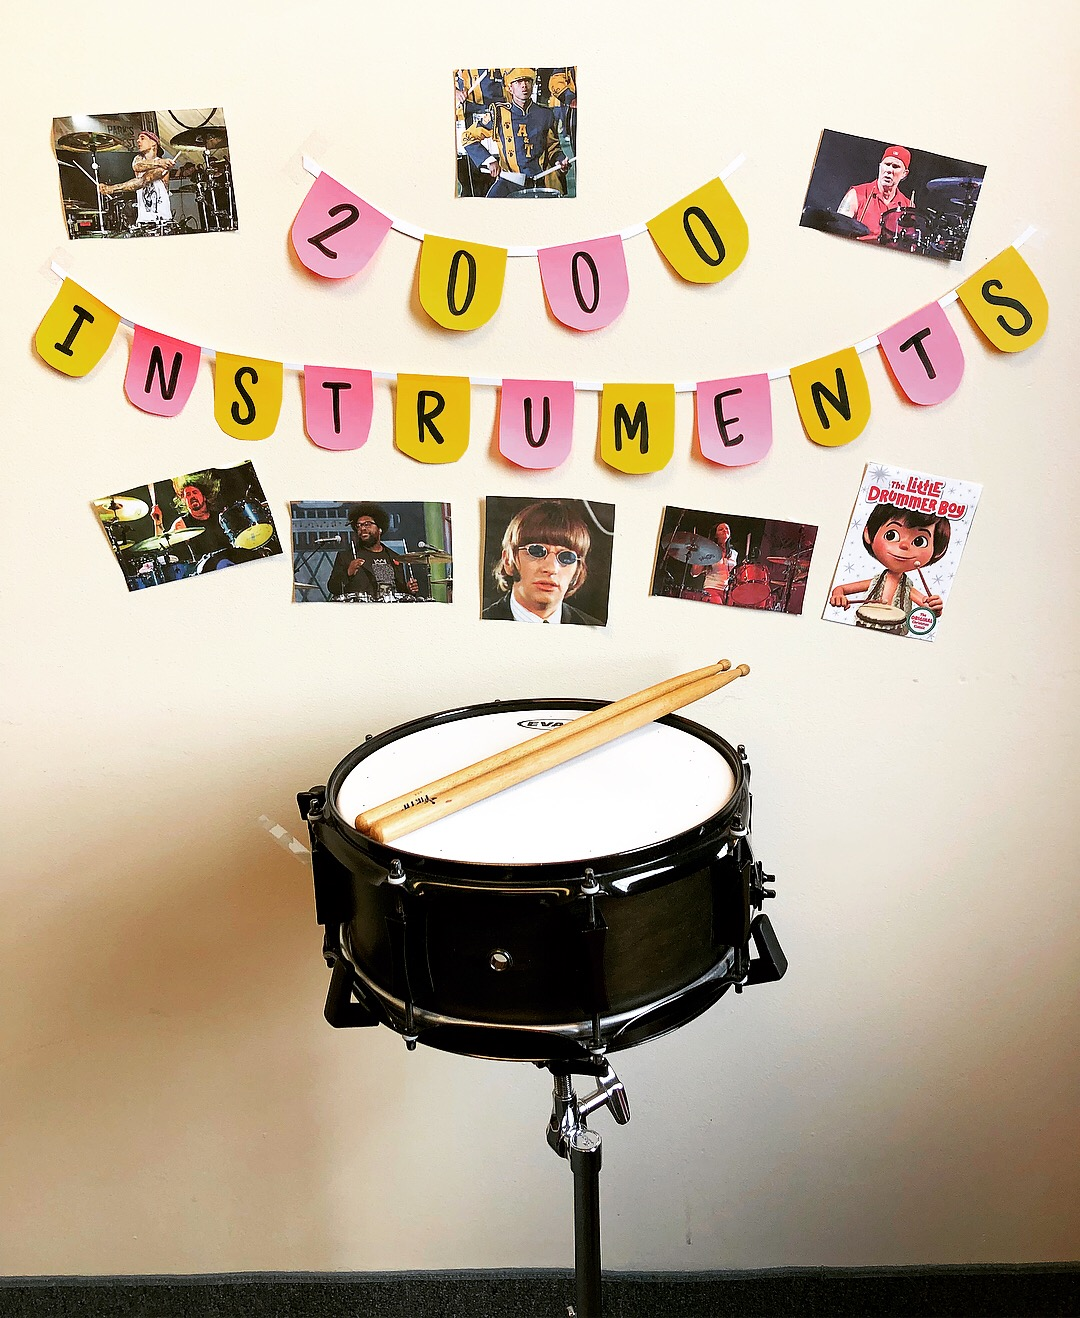 2000 instruments.jpg